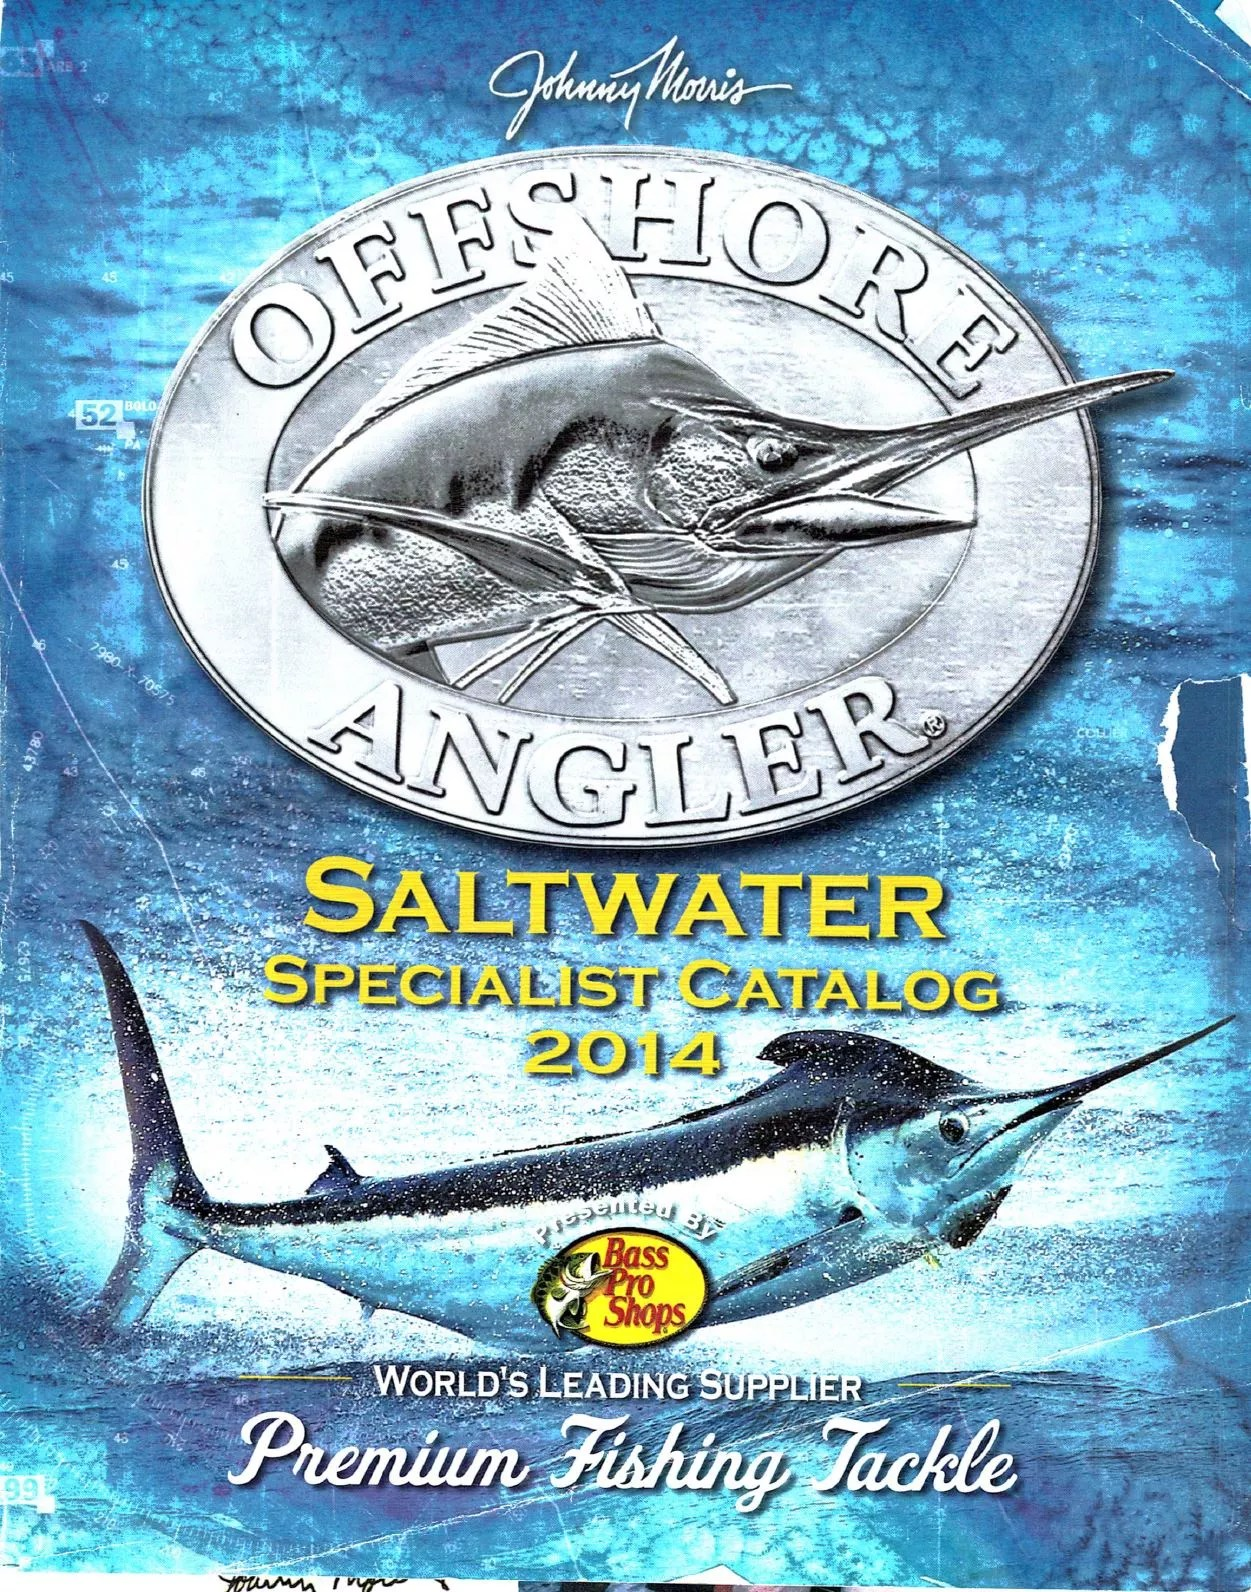 Bass Pro Shop Saltwater Angler Catalog 2014 – ORCA